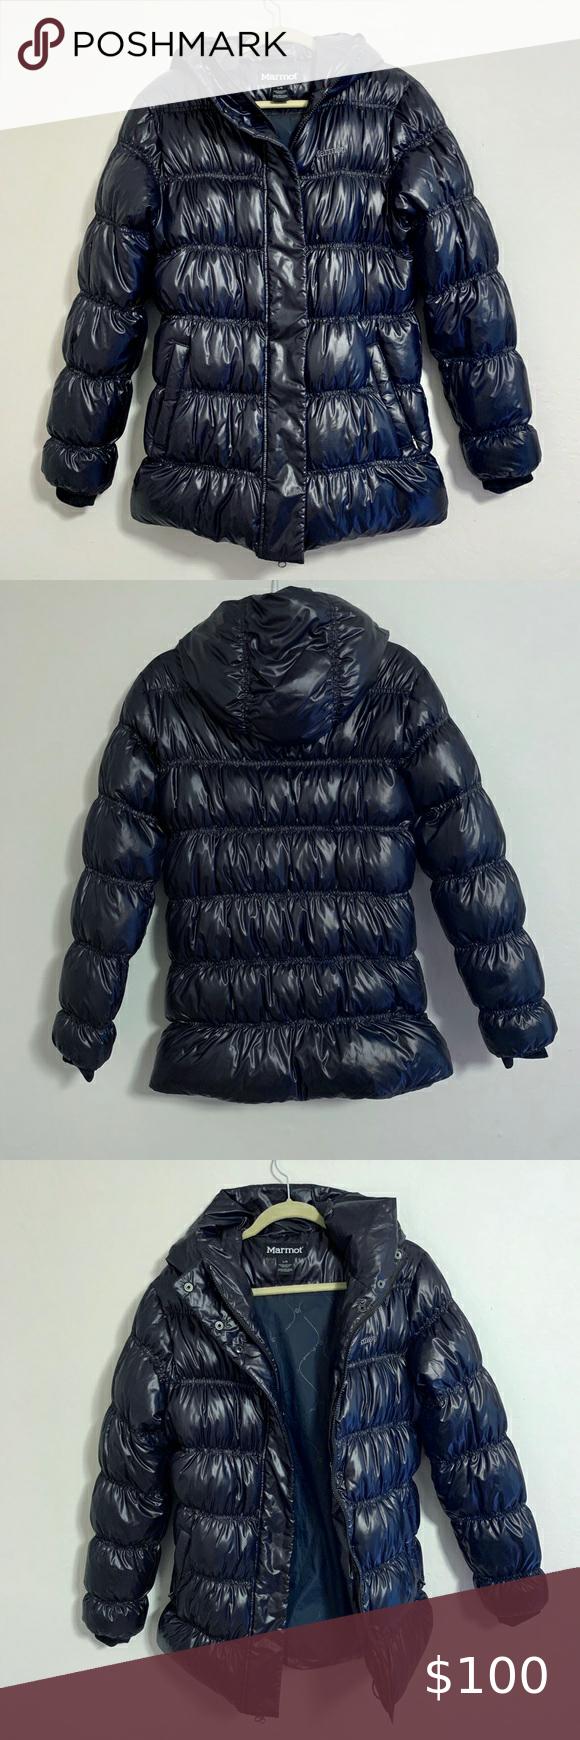 Marmot Black Reflective Puffer Jacket Long Super Warm And Cozy Puffer Jacket From Marmot Black Coat Down Filled Z Puffer Jacket Long Puffer Jackets Jackets [ 1740 x 580 Pixel ]